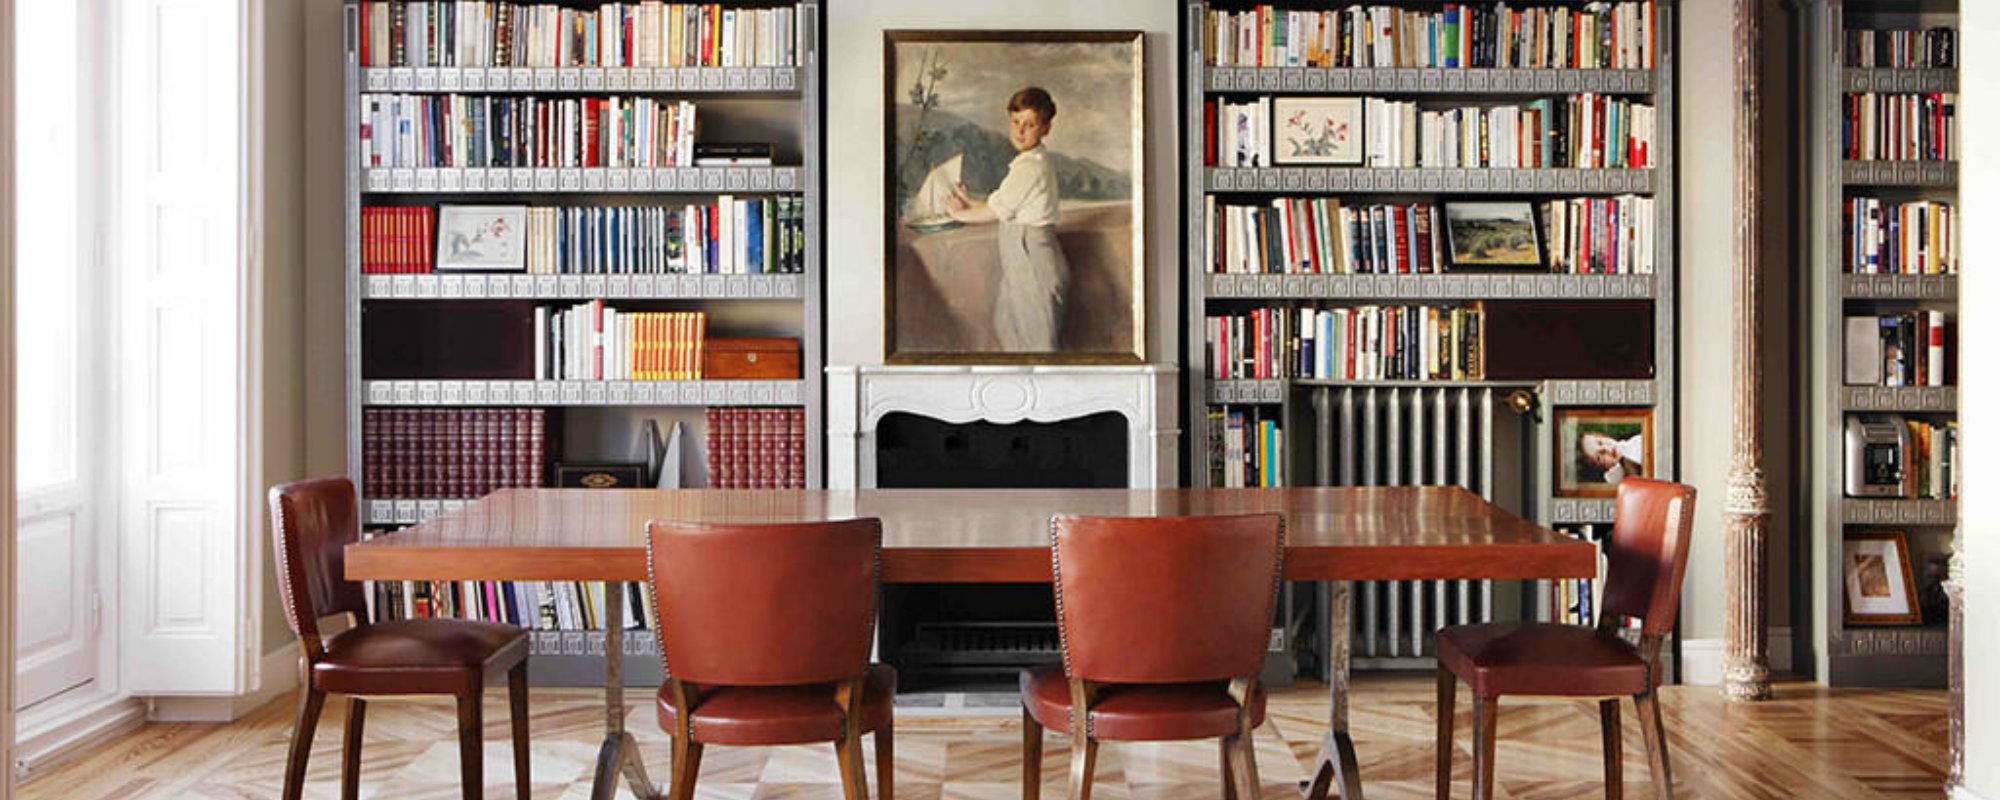 Interiorismo de lujo: Inés Benavides un estudio de lujo en Madrid interiorismo de lujo Interiorismo de lujo: Inés Benavides un estudio de lujo en Madrid featured